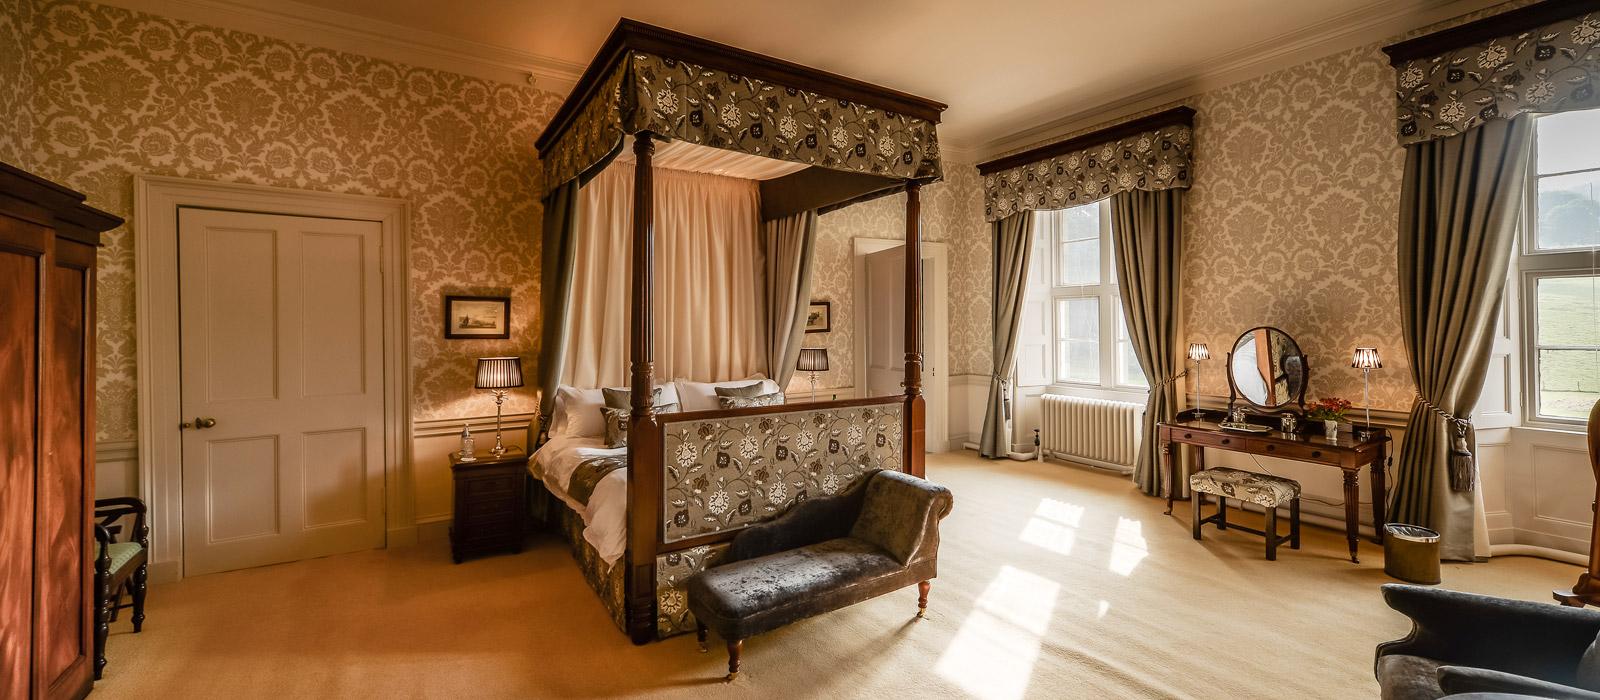 Grand room 4